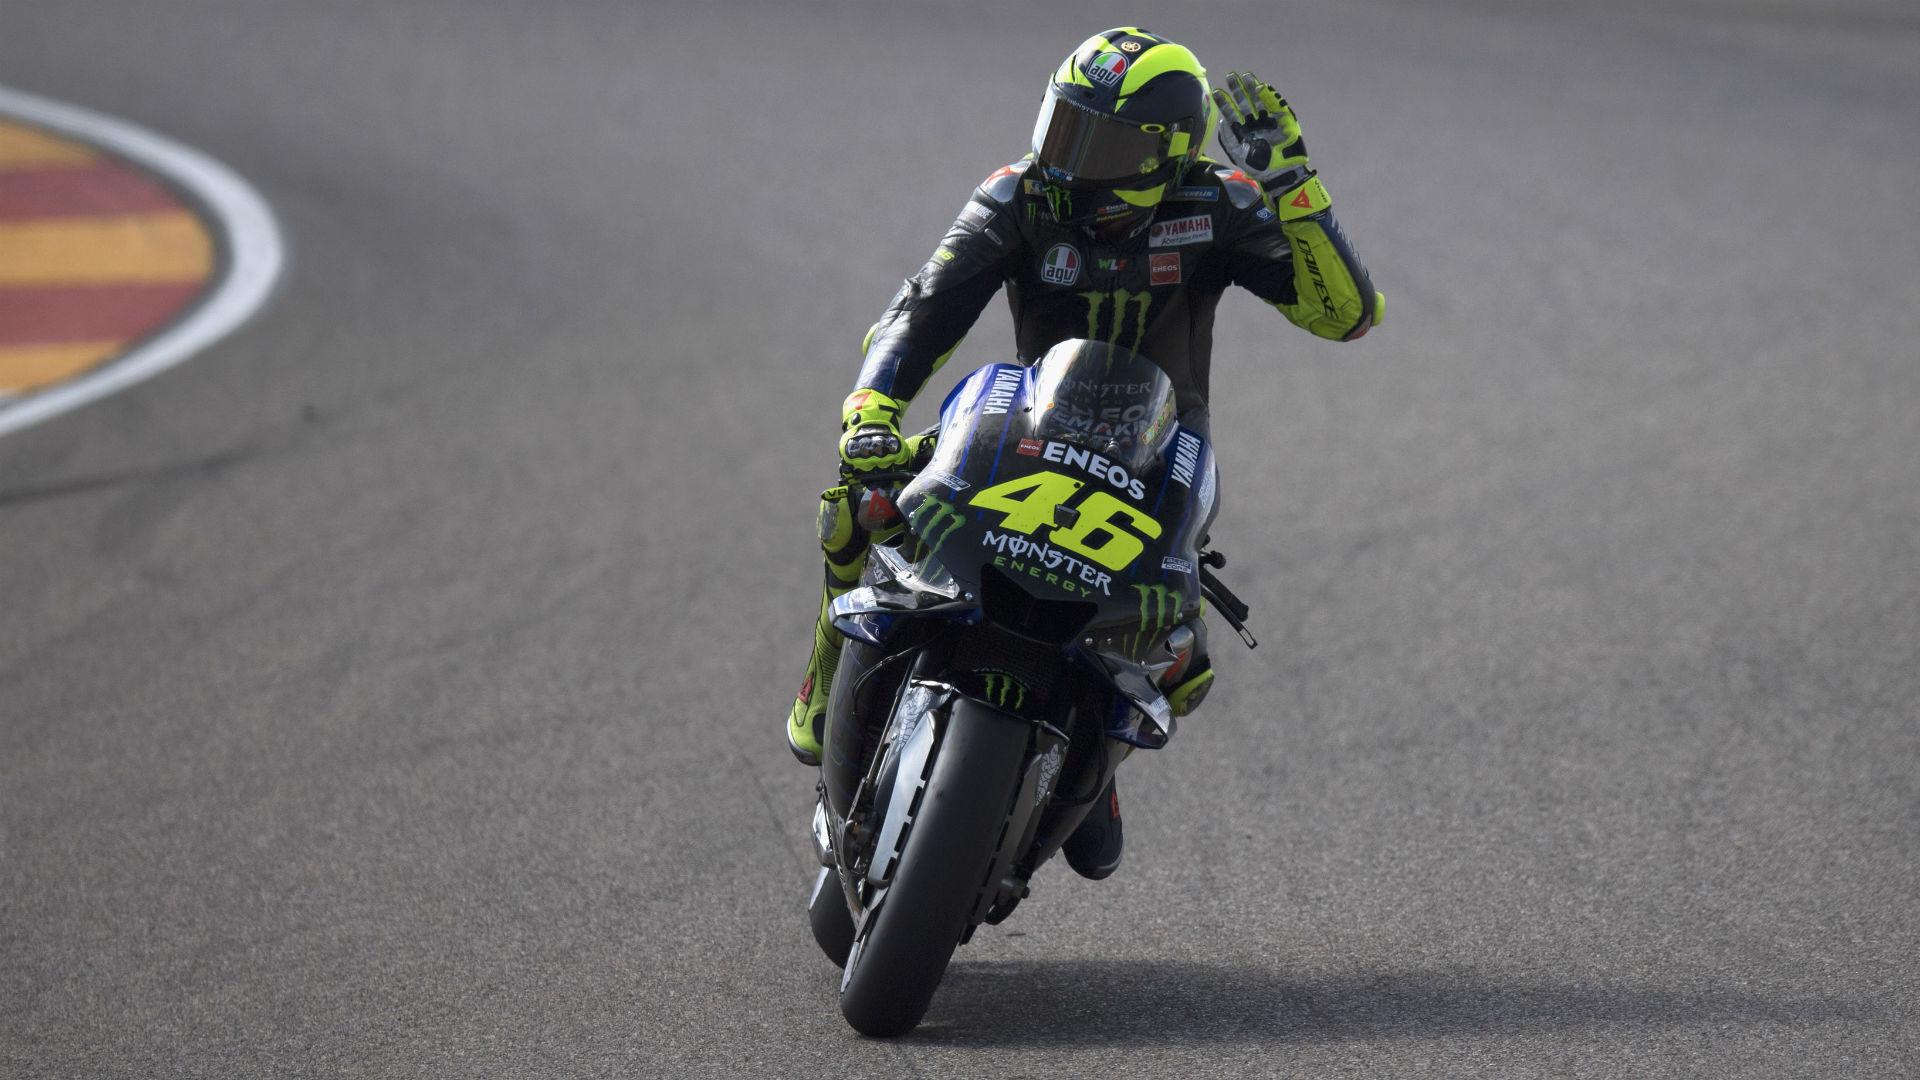 MotoGP Raceweek: Rossi to celebrate 400 milestone - Australian MotoGP in numbers